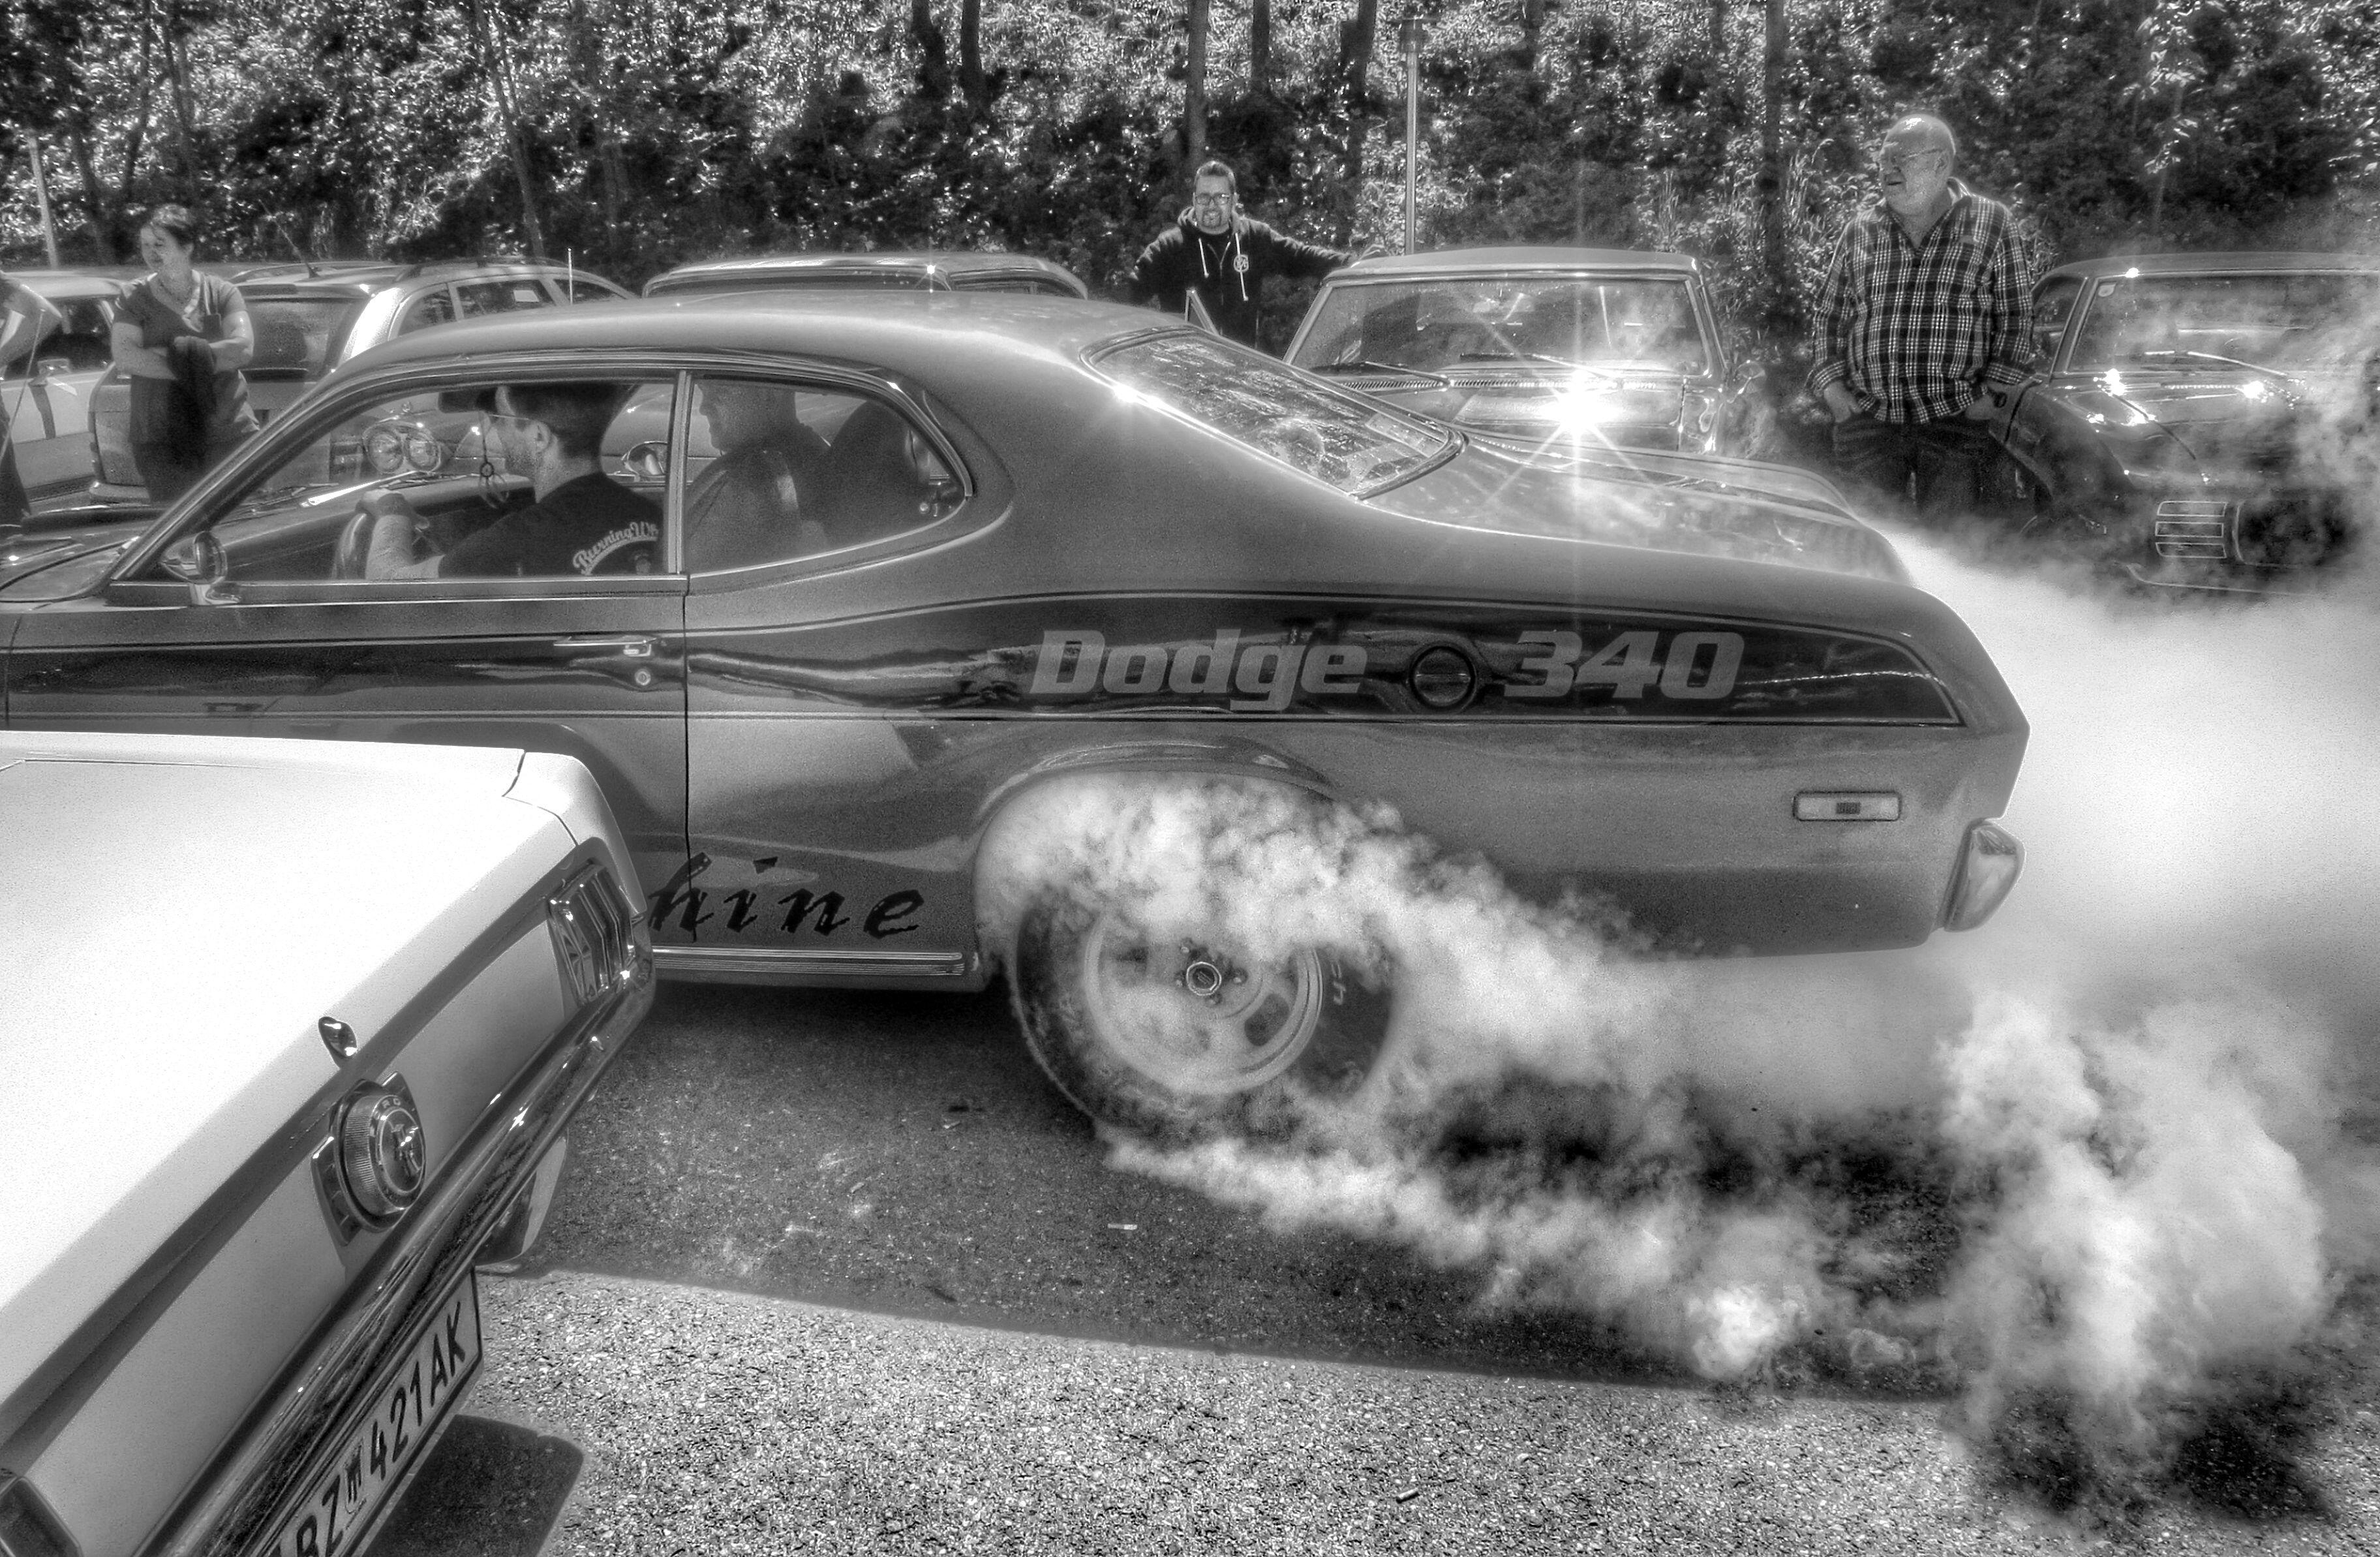 Brunch & #Burnouts 2014 at Miami Roadhouse Koblach Austria ...